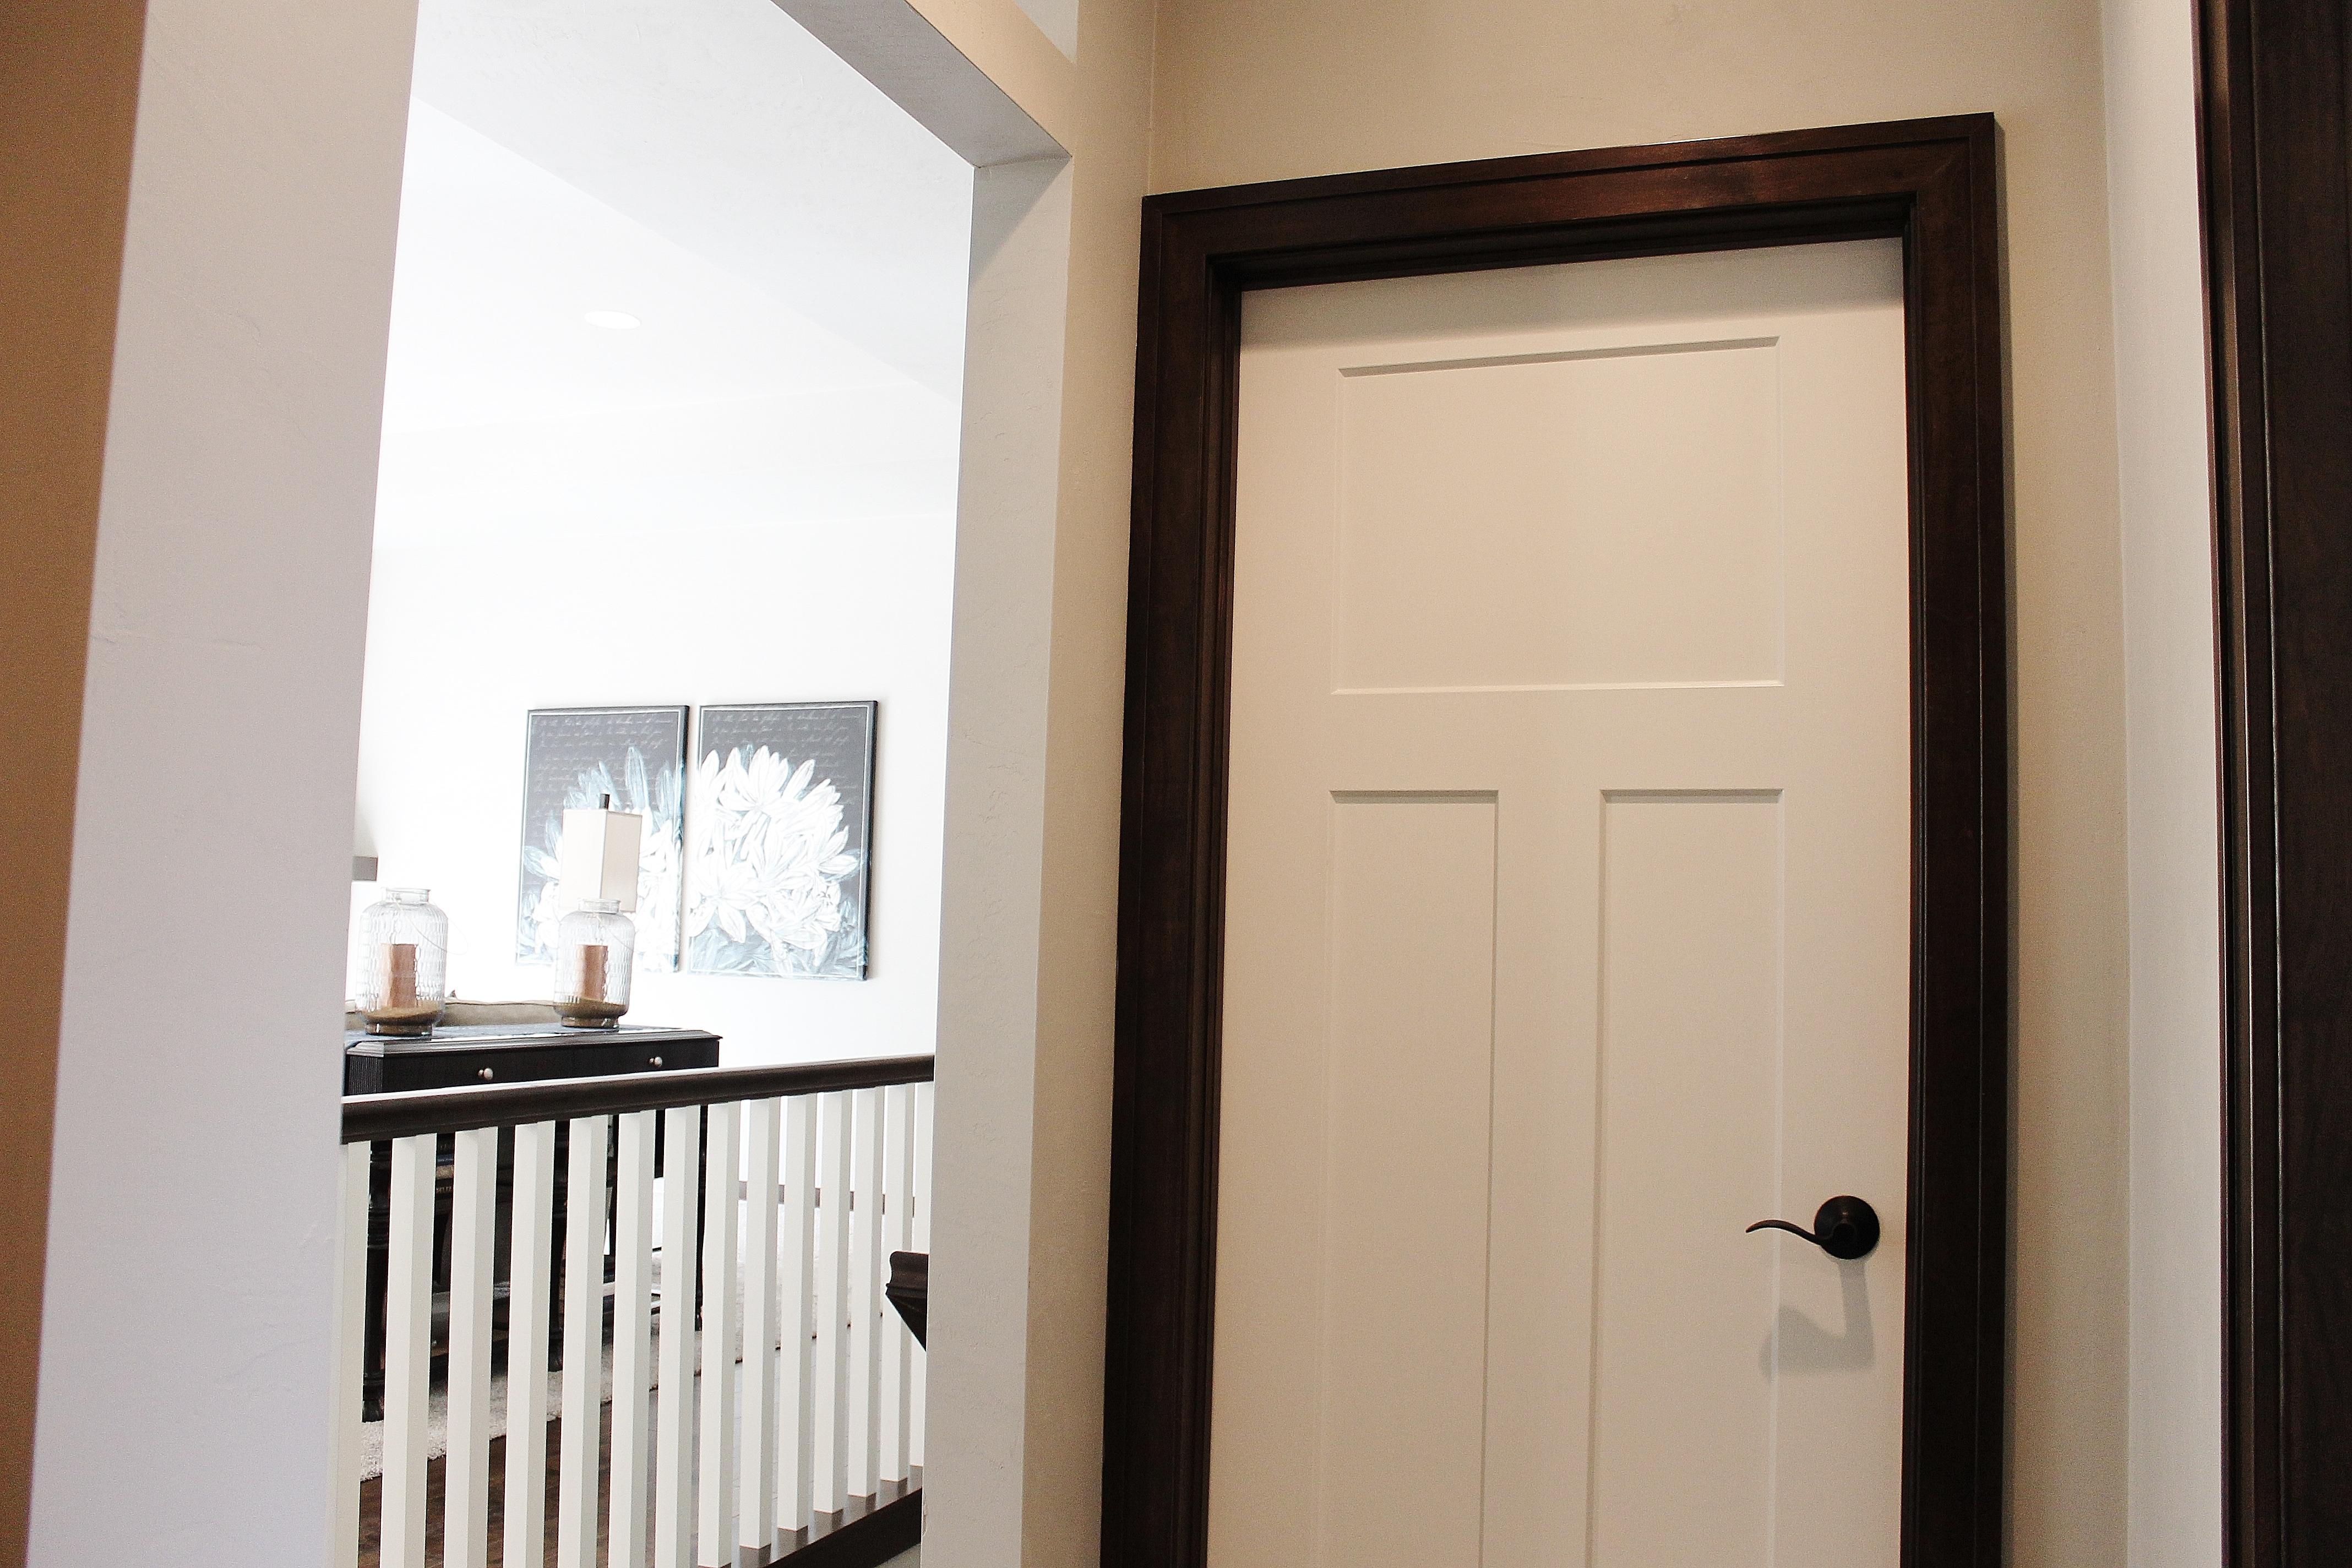 How To Choose Your Interior Door Style